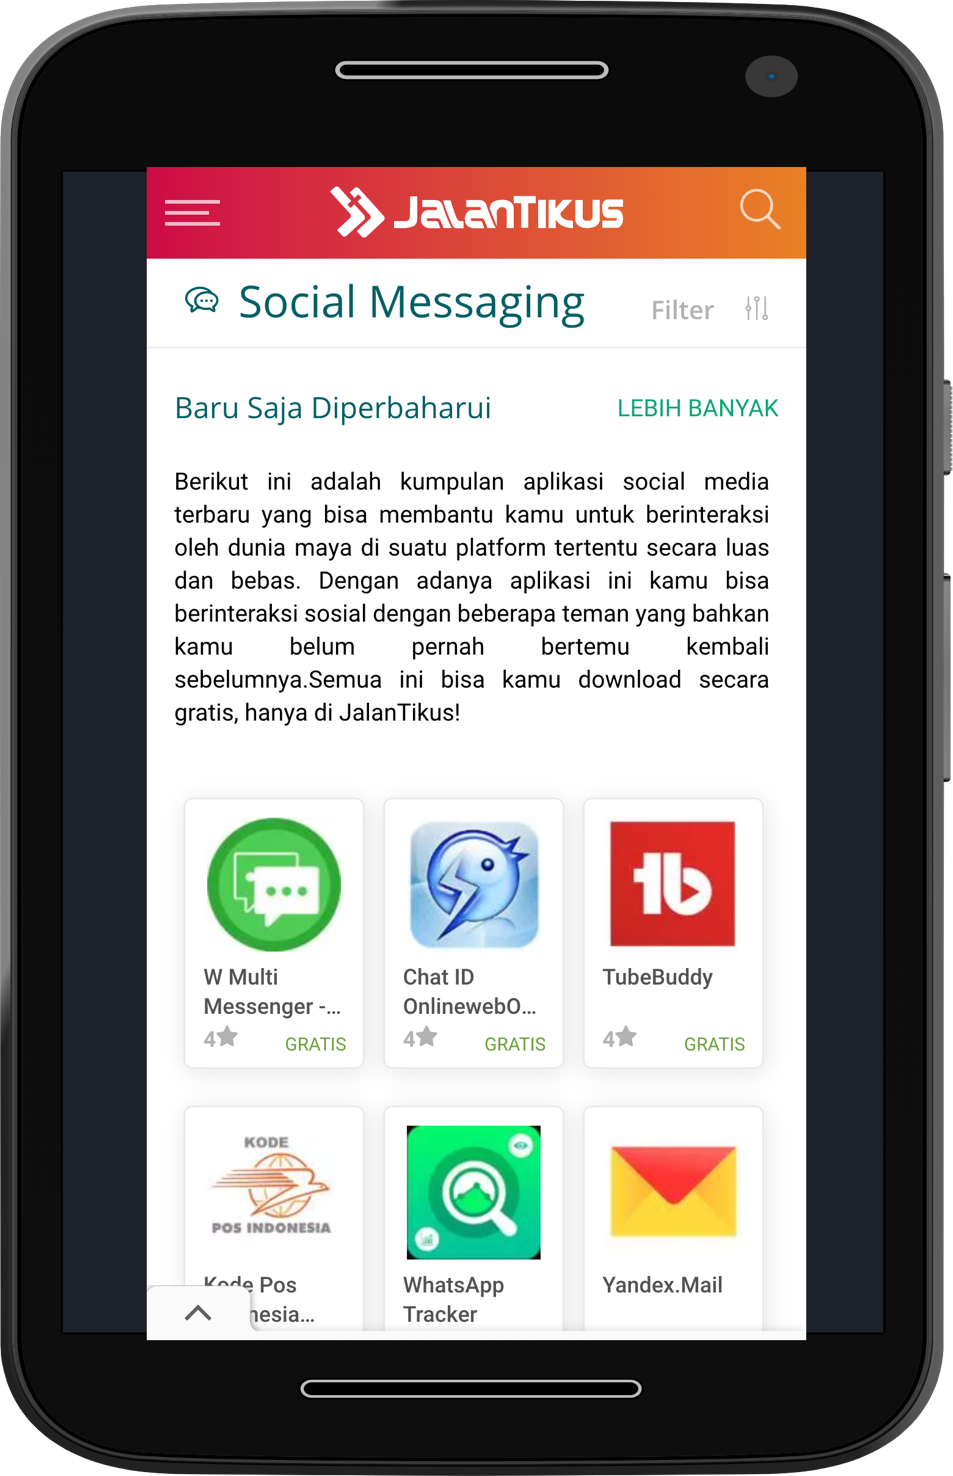 Berbagai jenis aplikasi chatting di JalanTikus.com